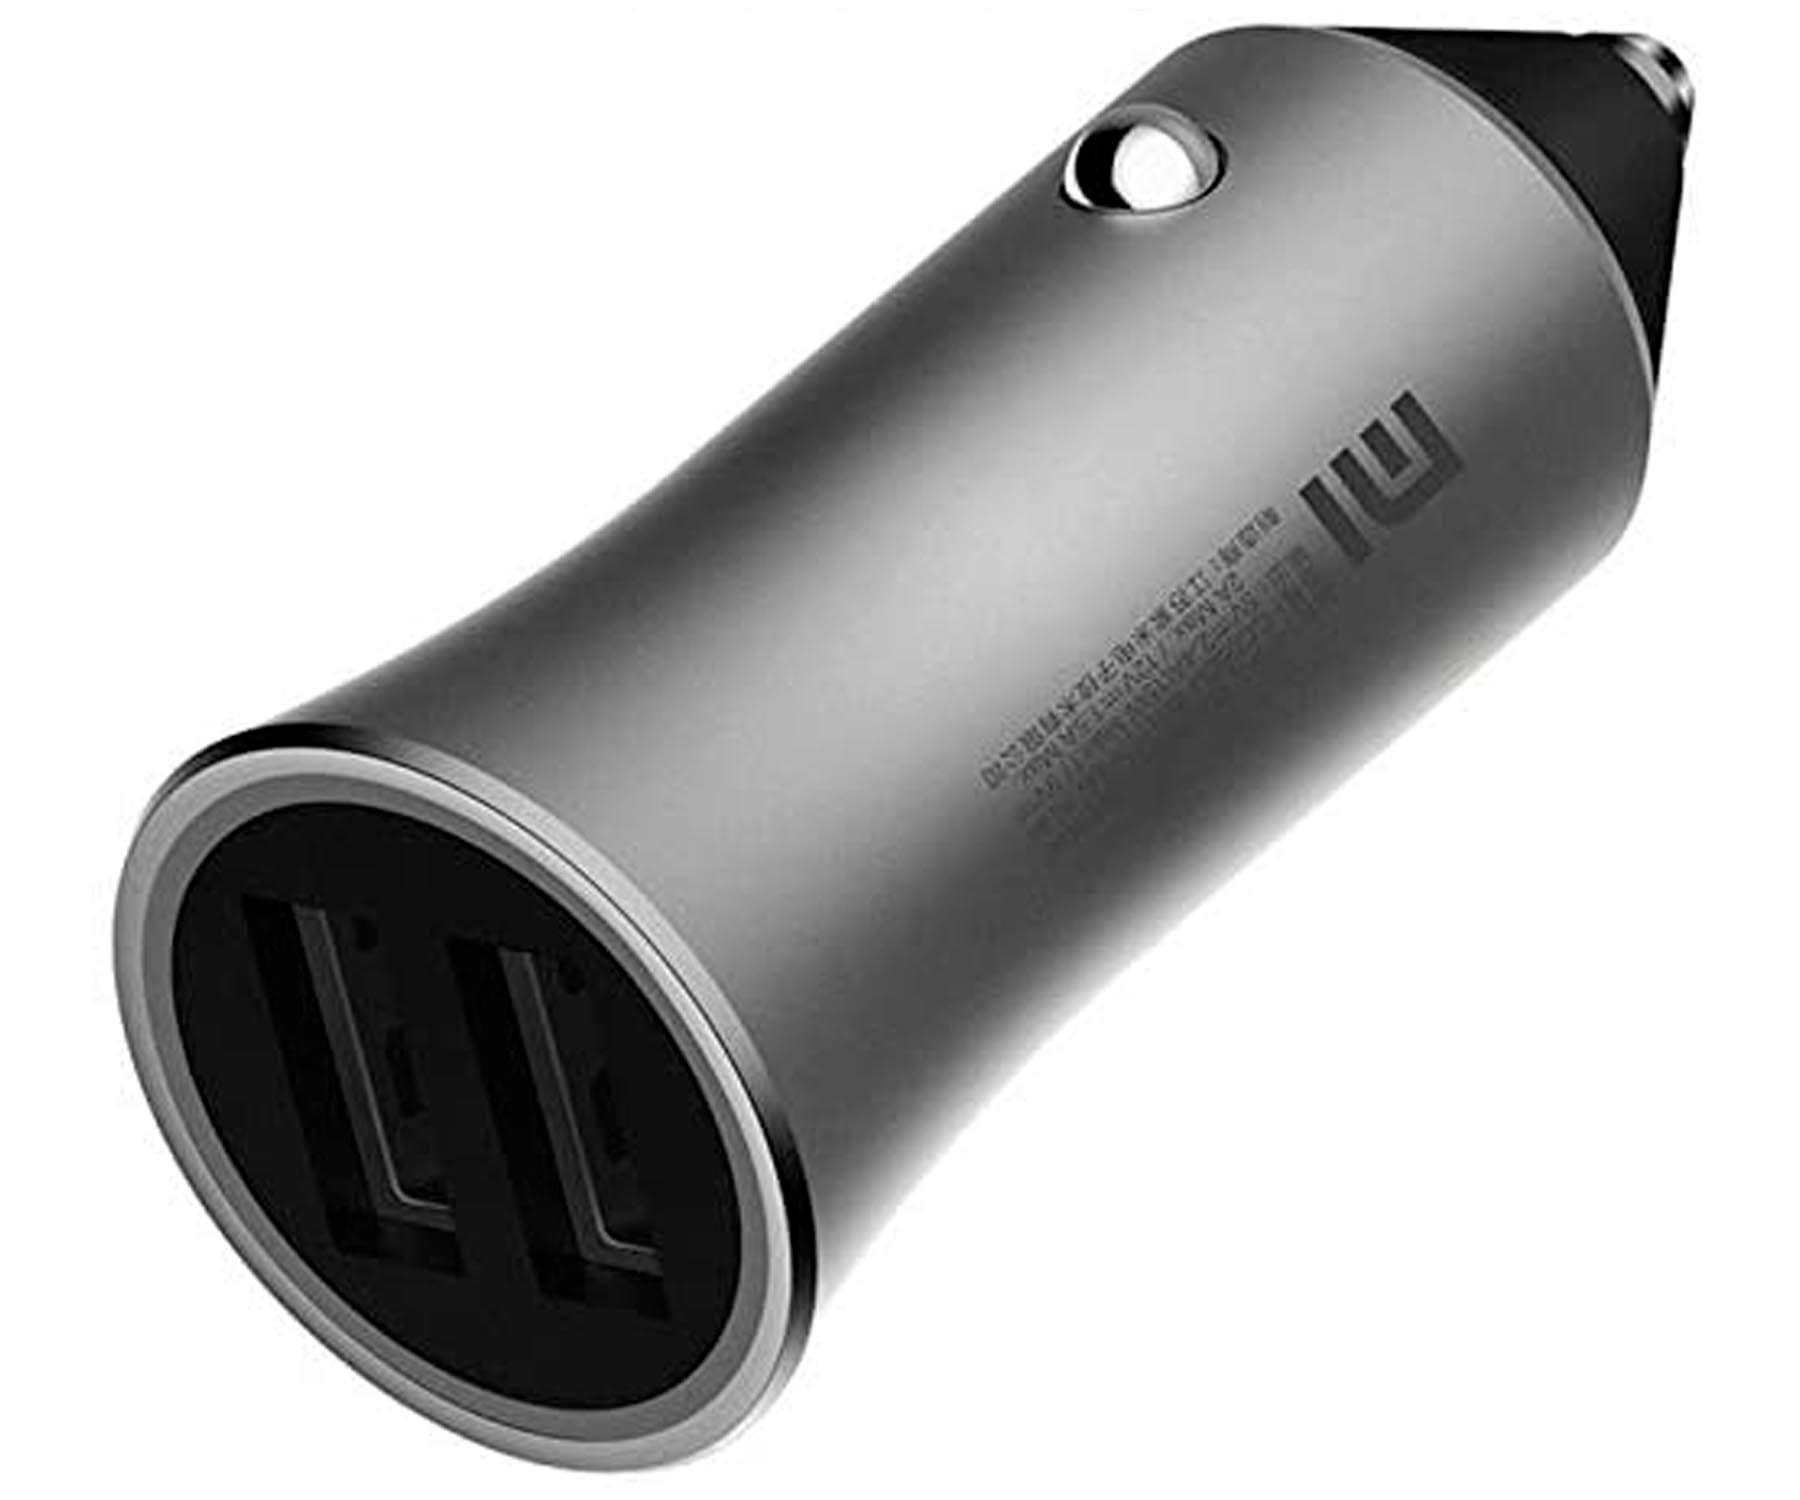 XIAOMI GDS4104GL CARGADOR DOBLE USB PARA MECHERO DEL COCHE 18W